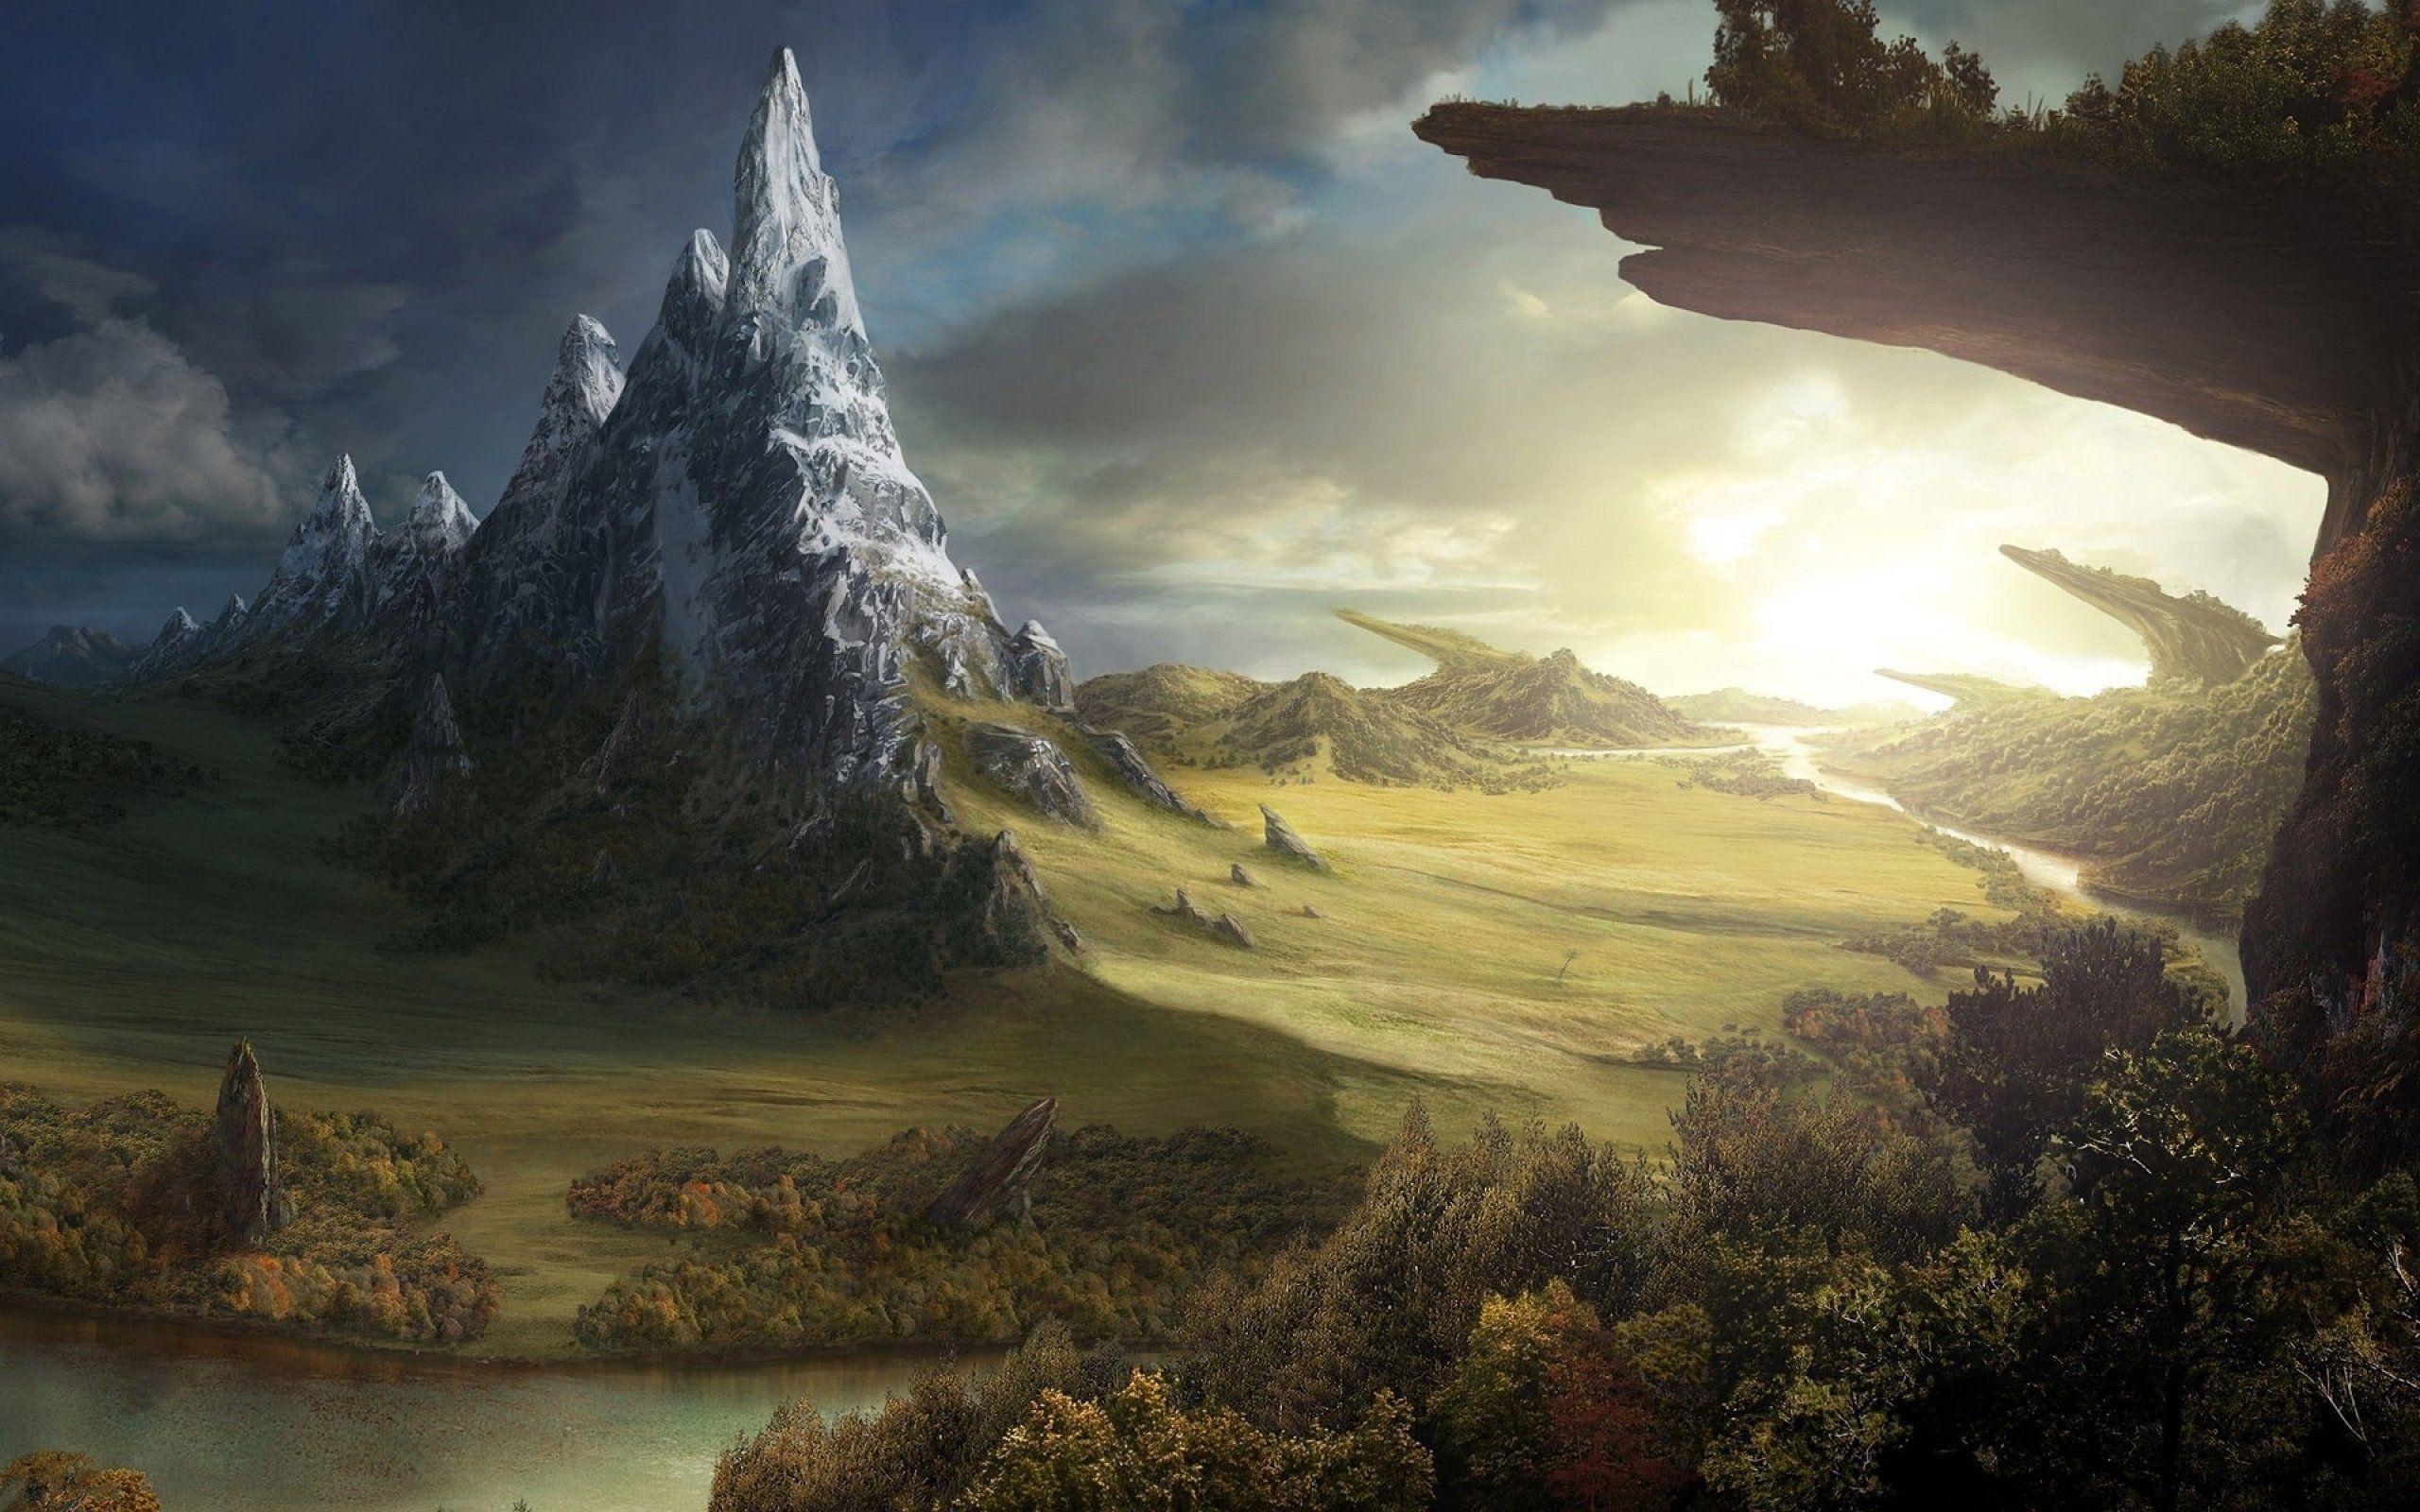 Epic Landscapes And Designs